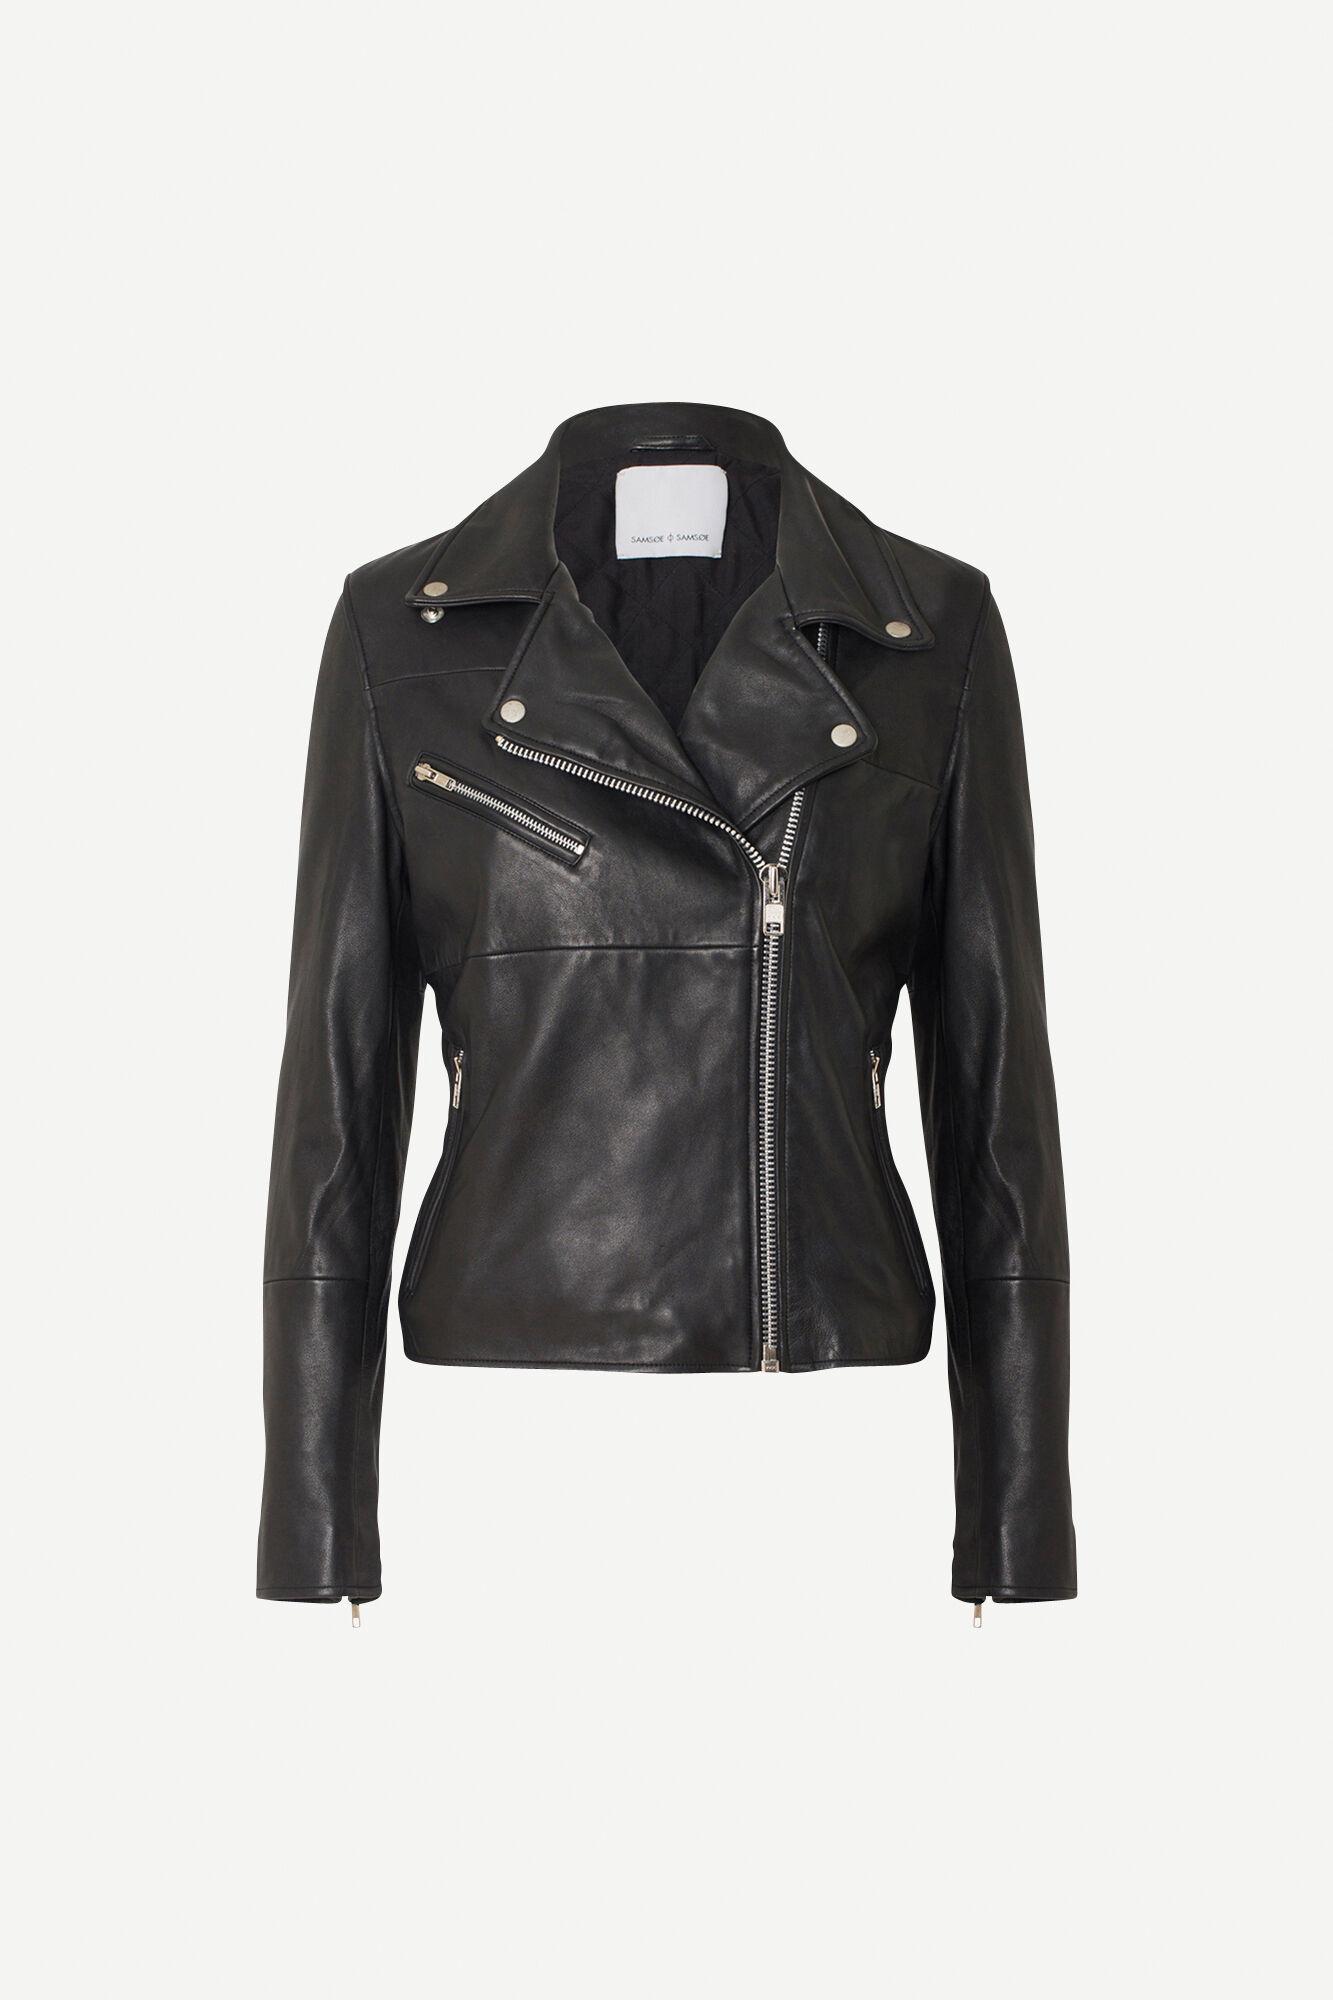 tautou leather jacket samsoe samsoe-1